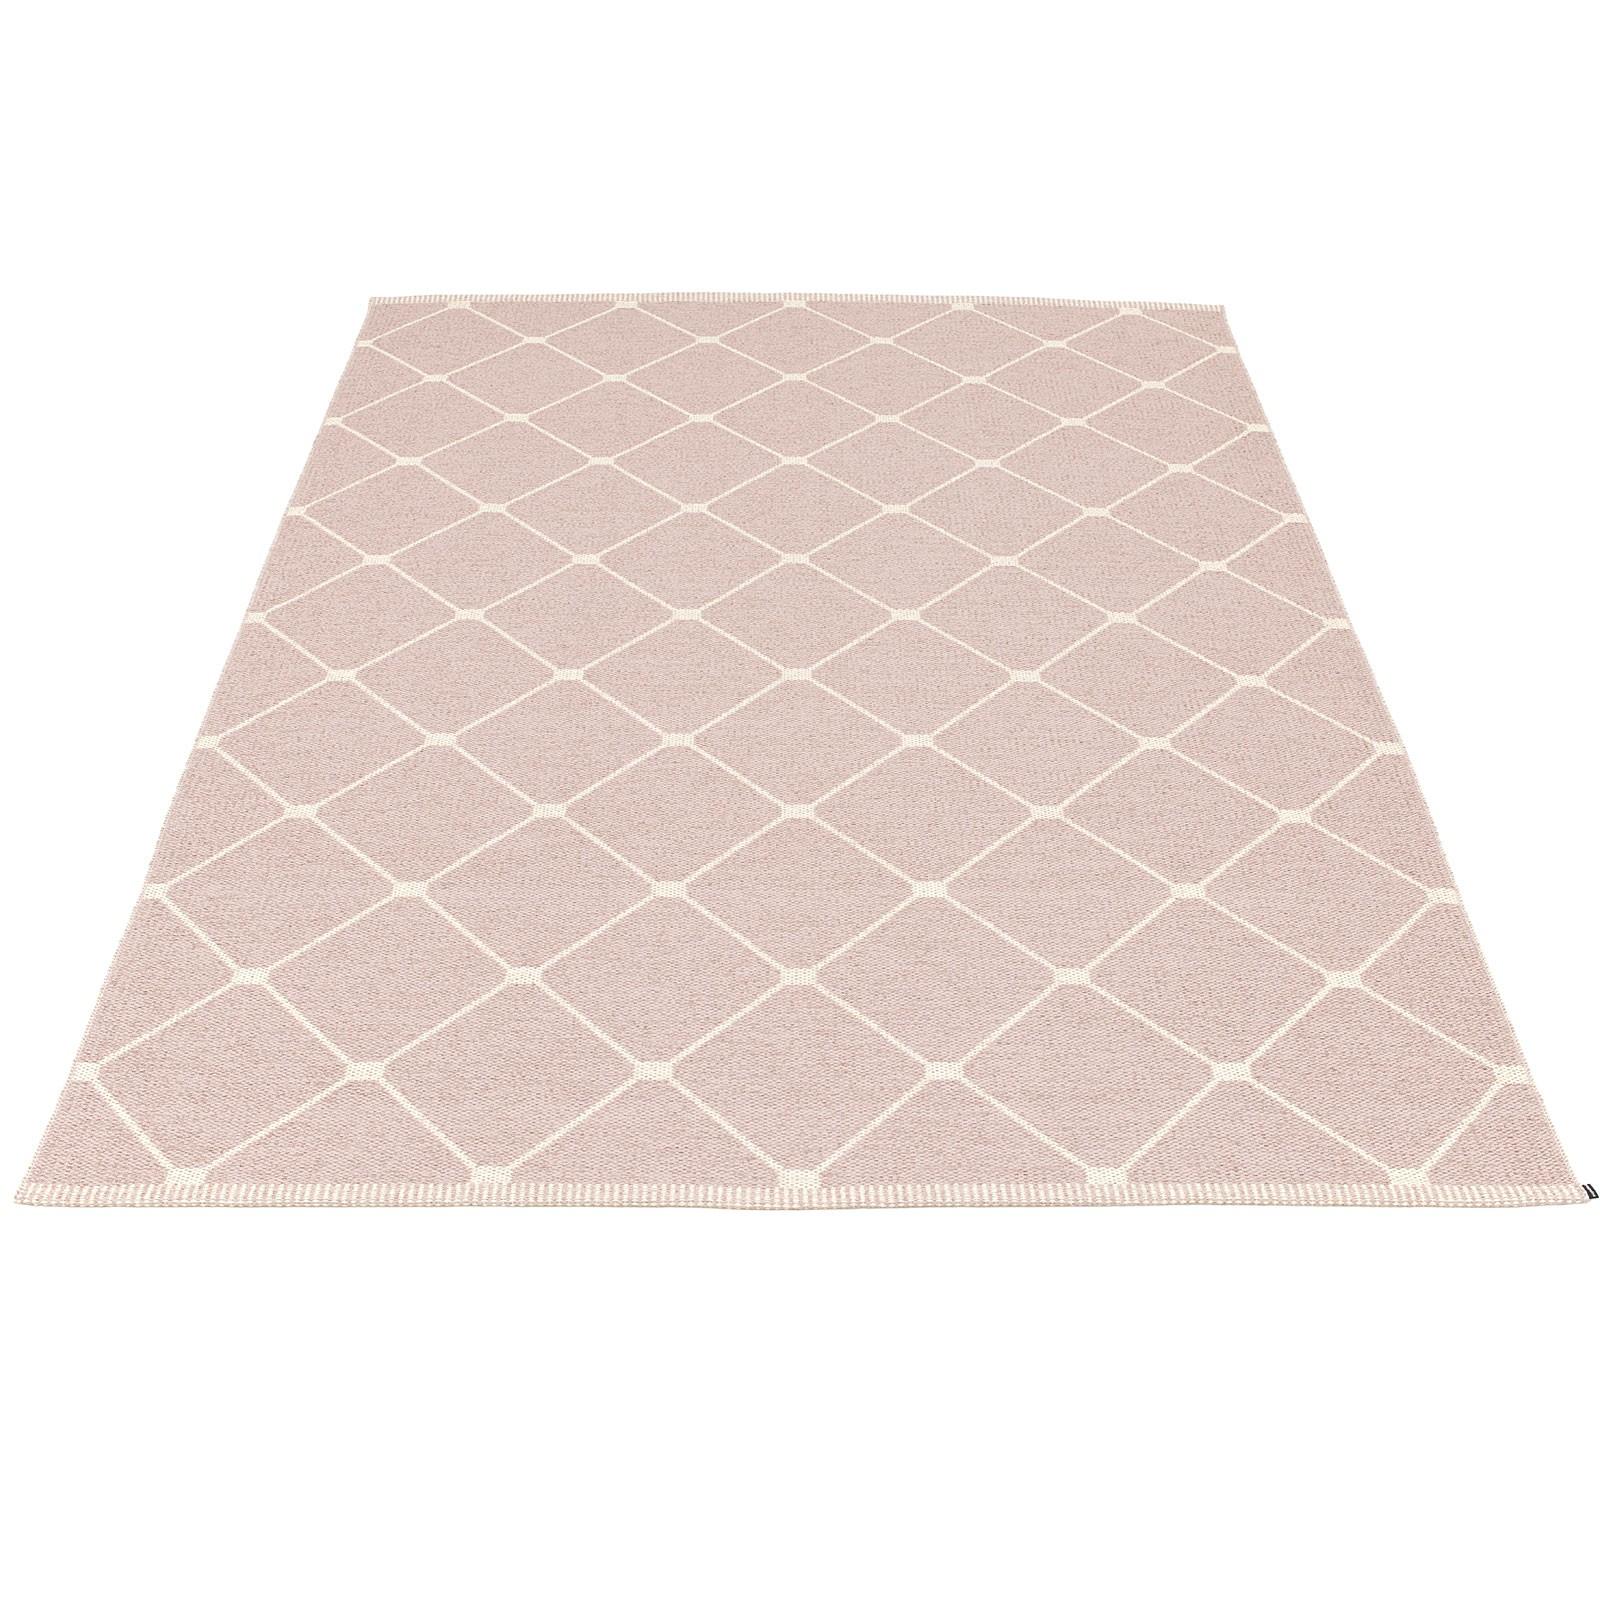 Pappelina Teppich teppich pale 180 x 275 cm pappelina